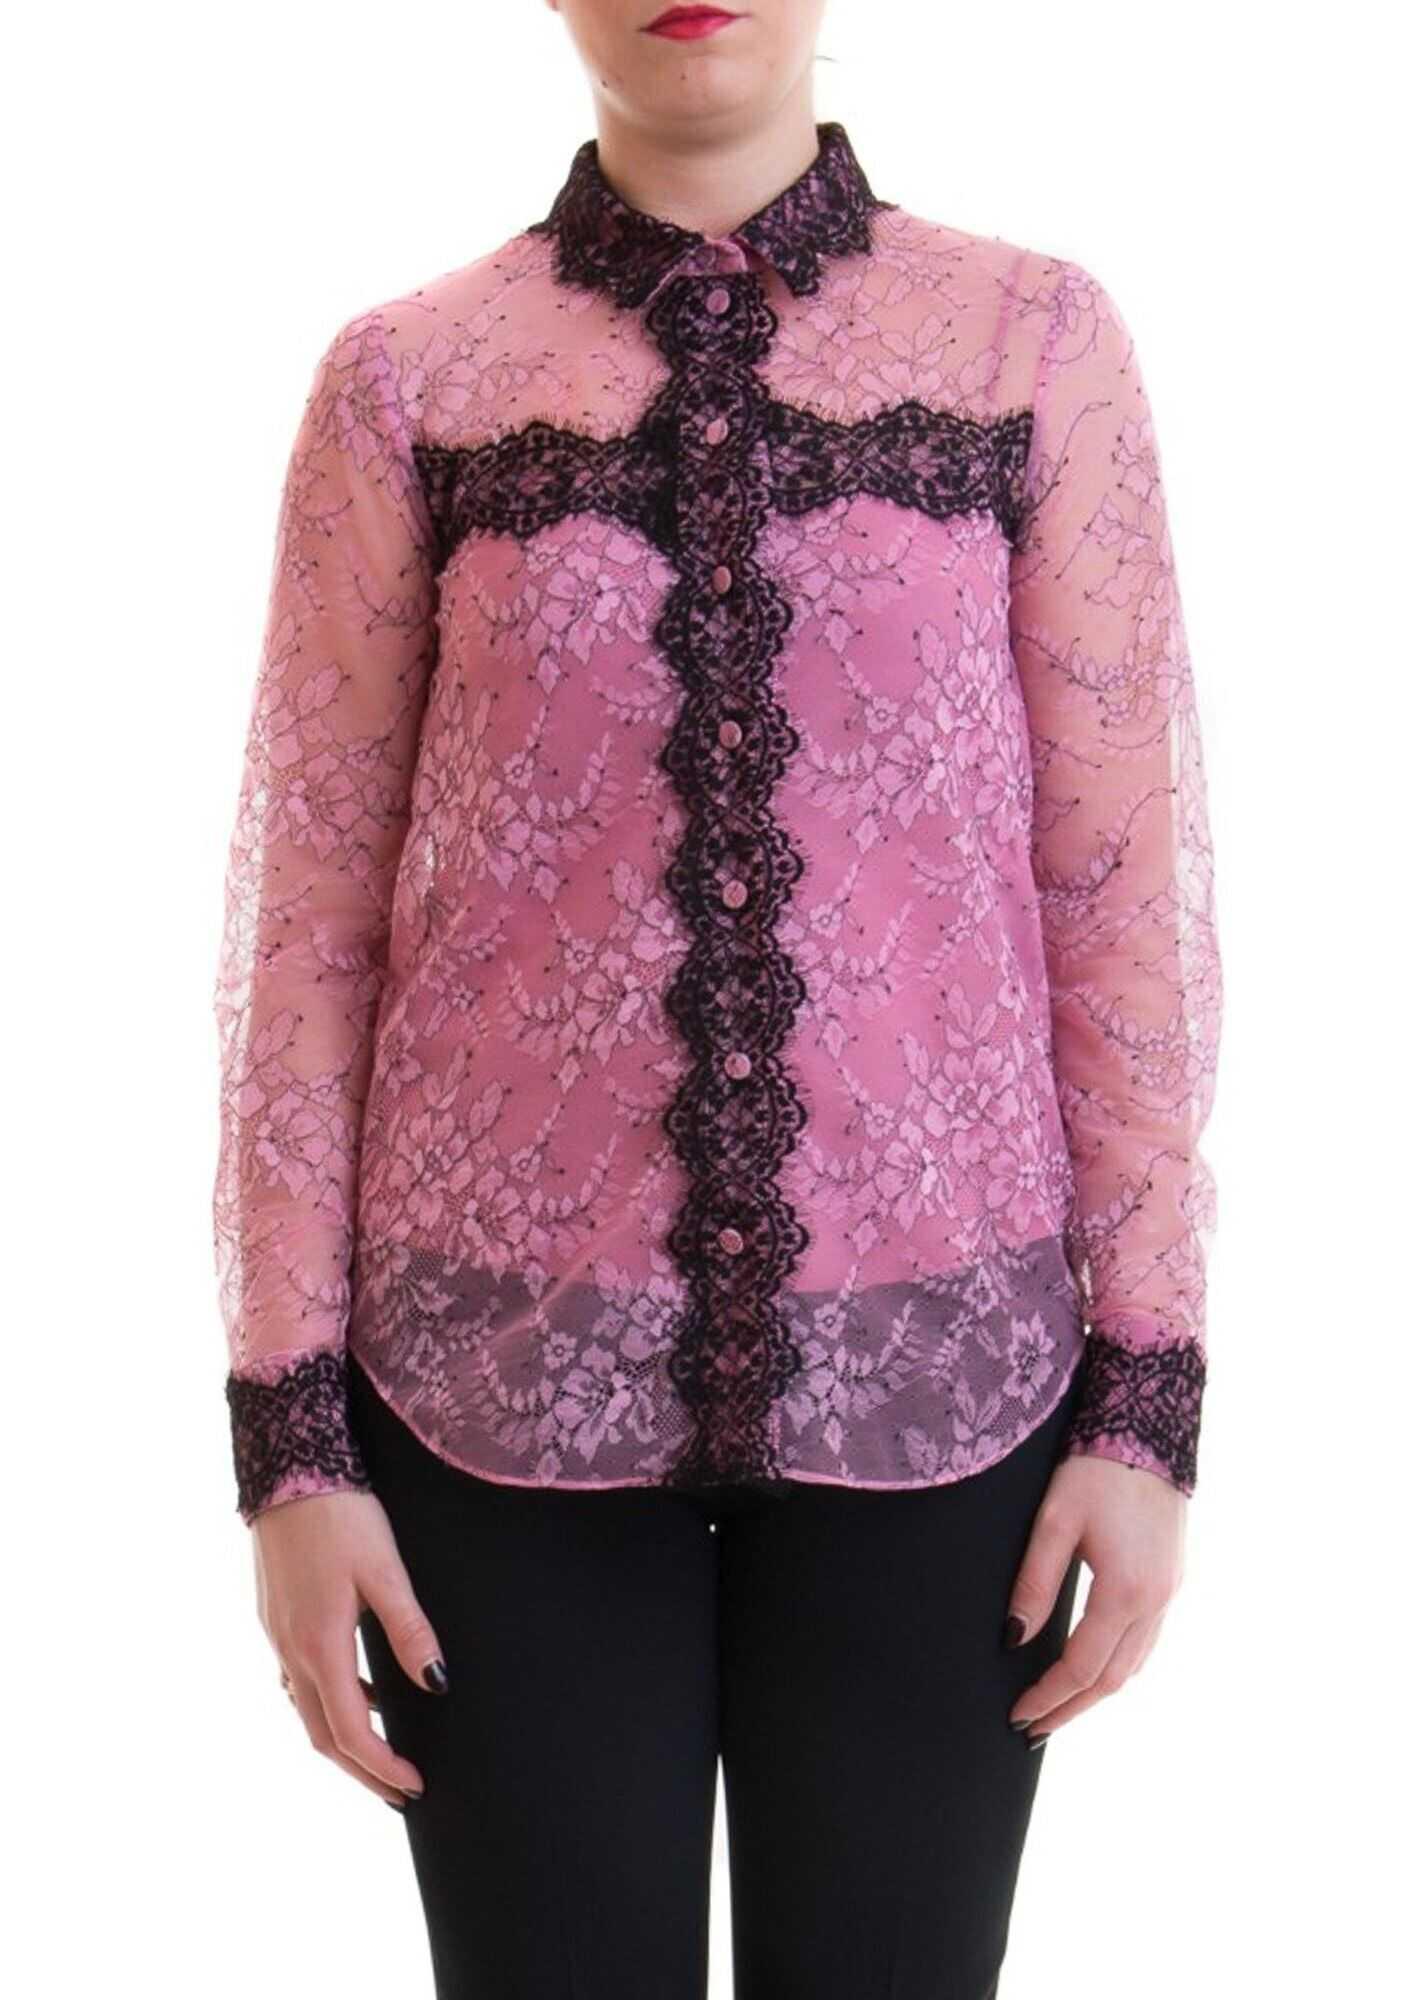 Blumarine Two-Tone Lace Shirt Pink